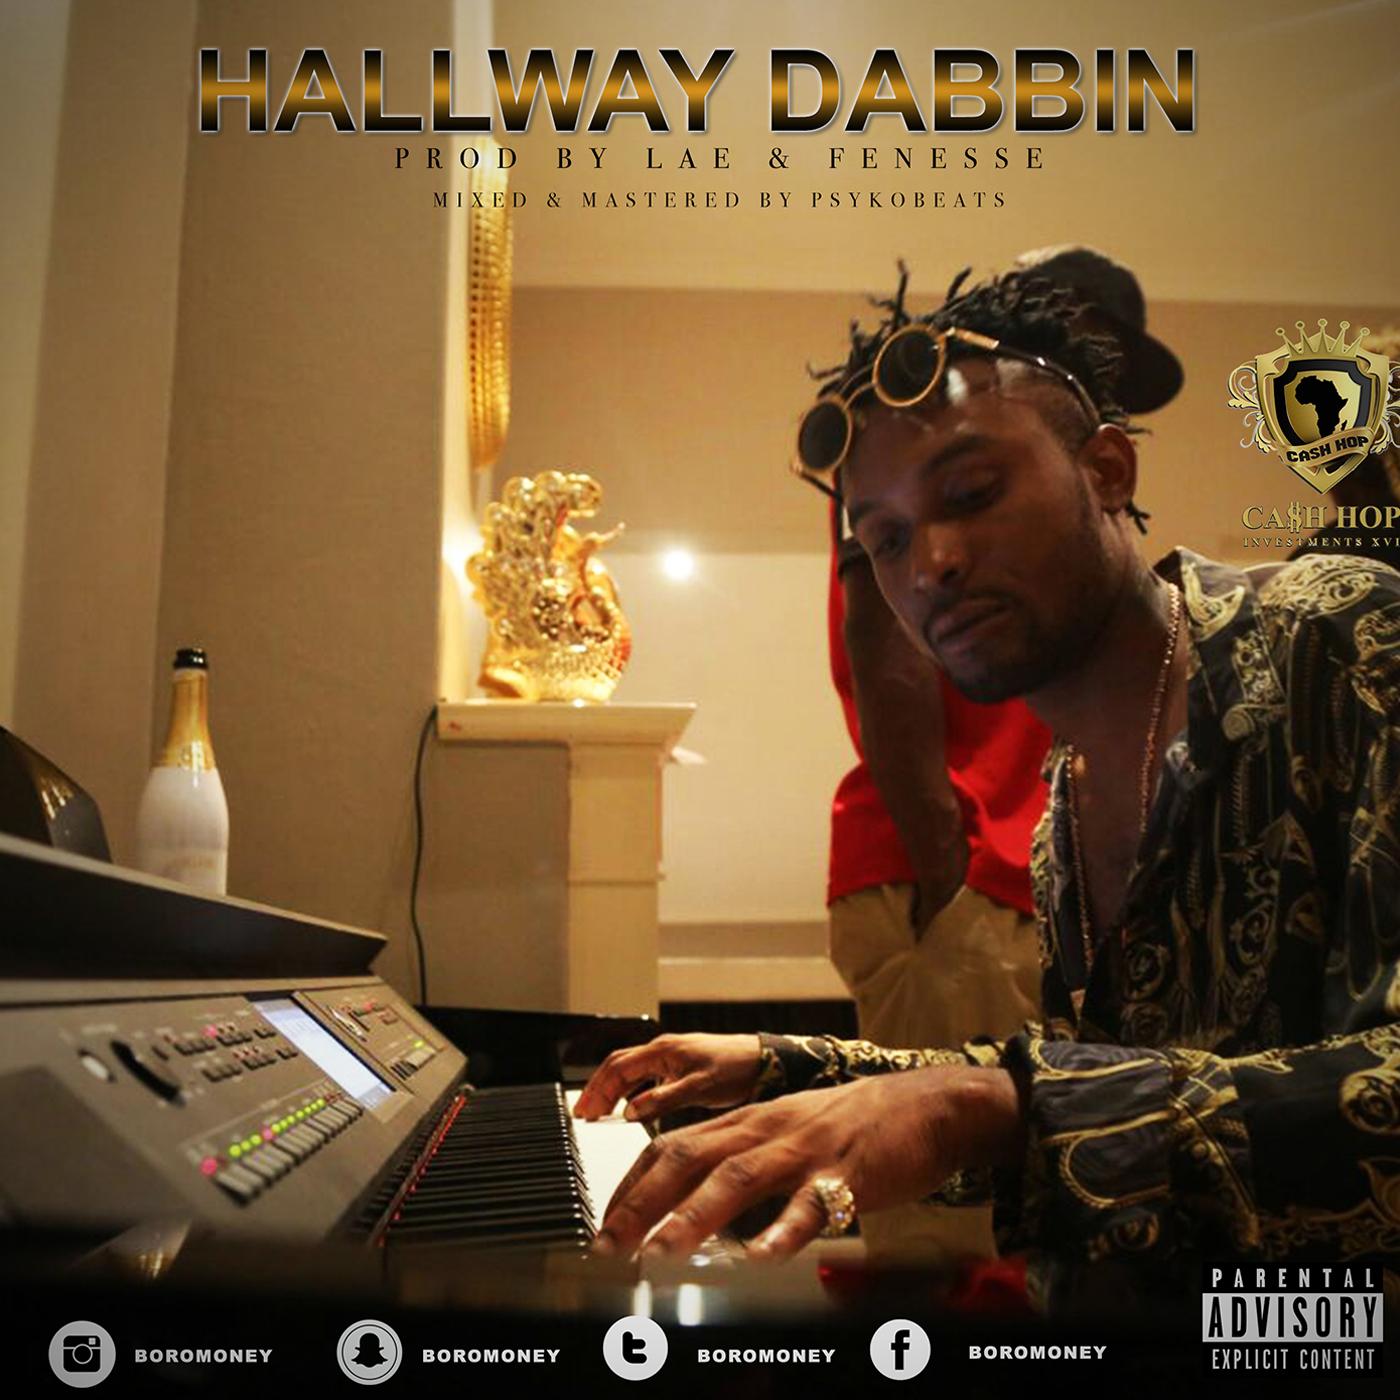 VIDEO: BoroMoney – Hallway Dabbing (Dir Cash Hop)